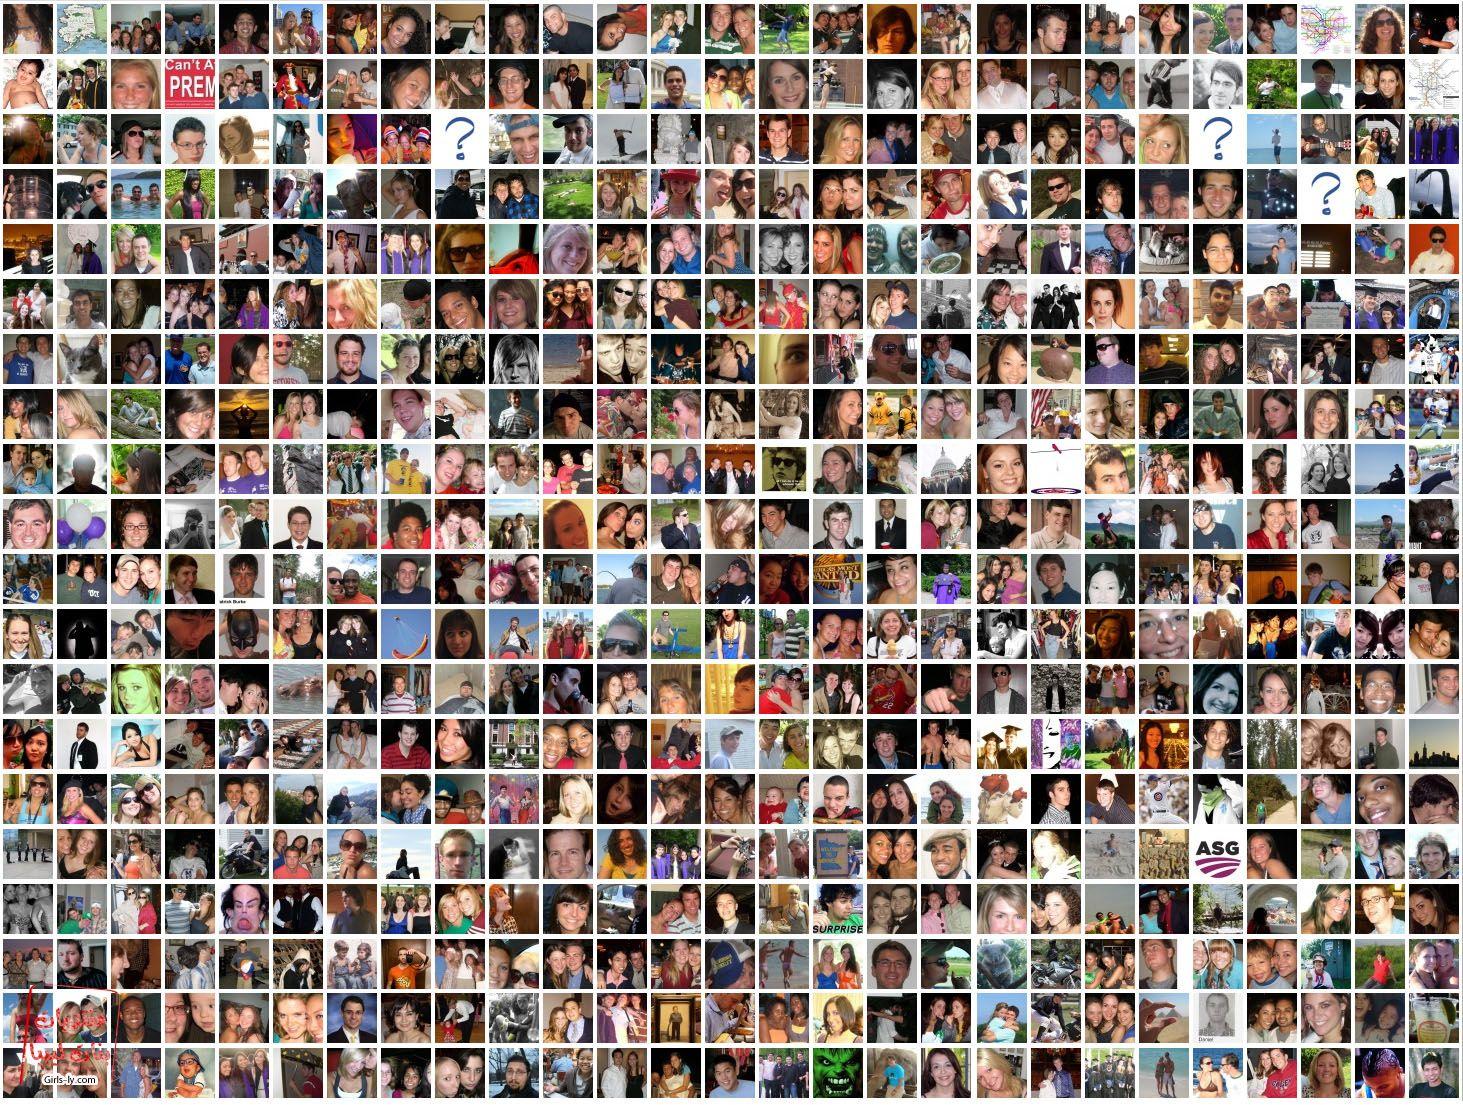 بالصور القاب بنات للفيس مميزة c8bfc3a9cb574cf88a5c2c920e56df27